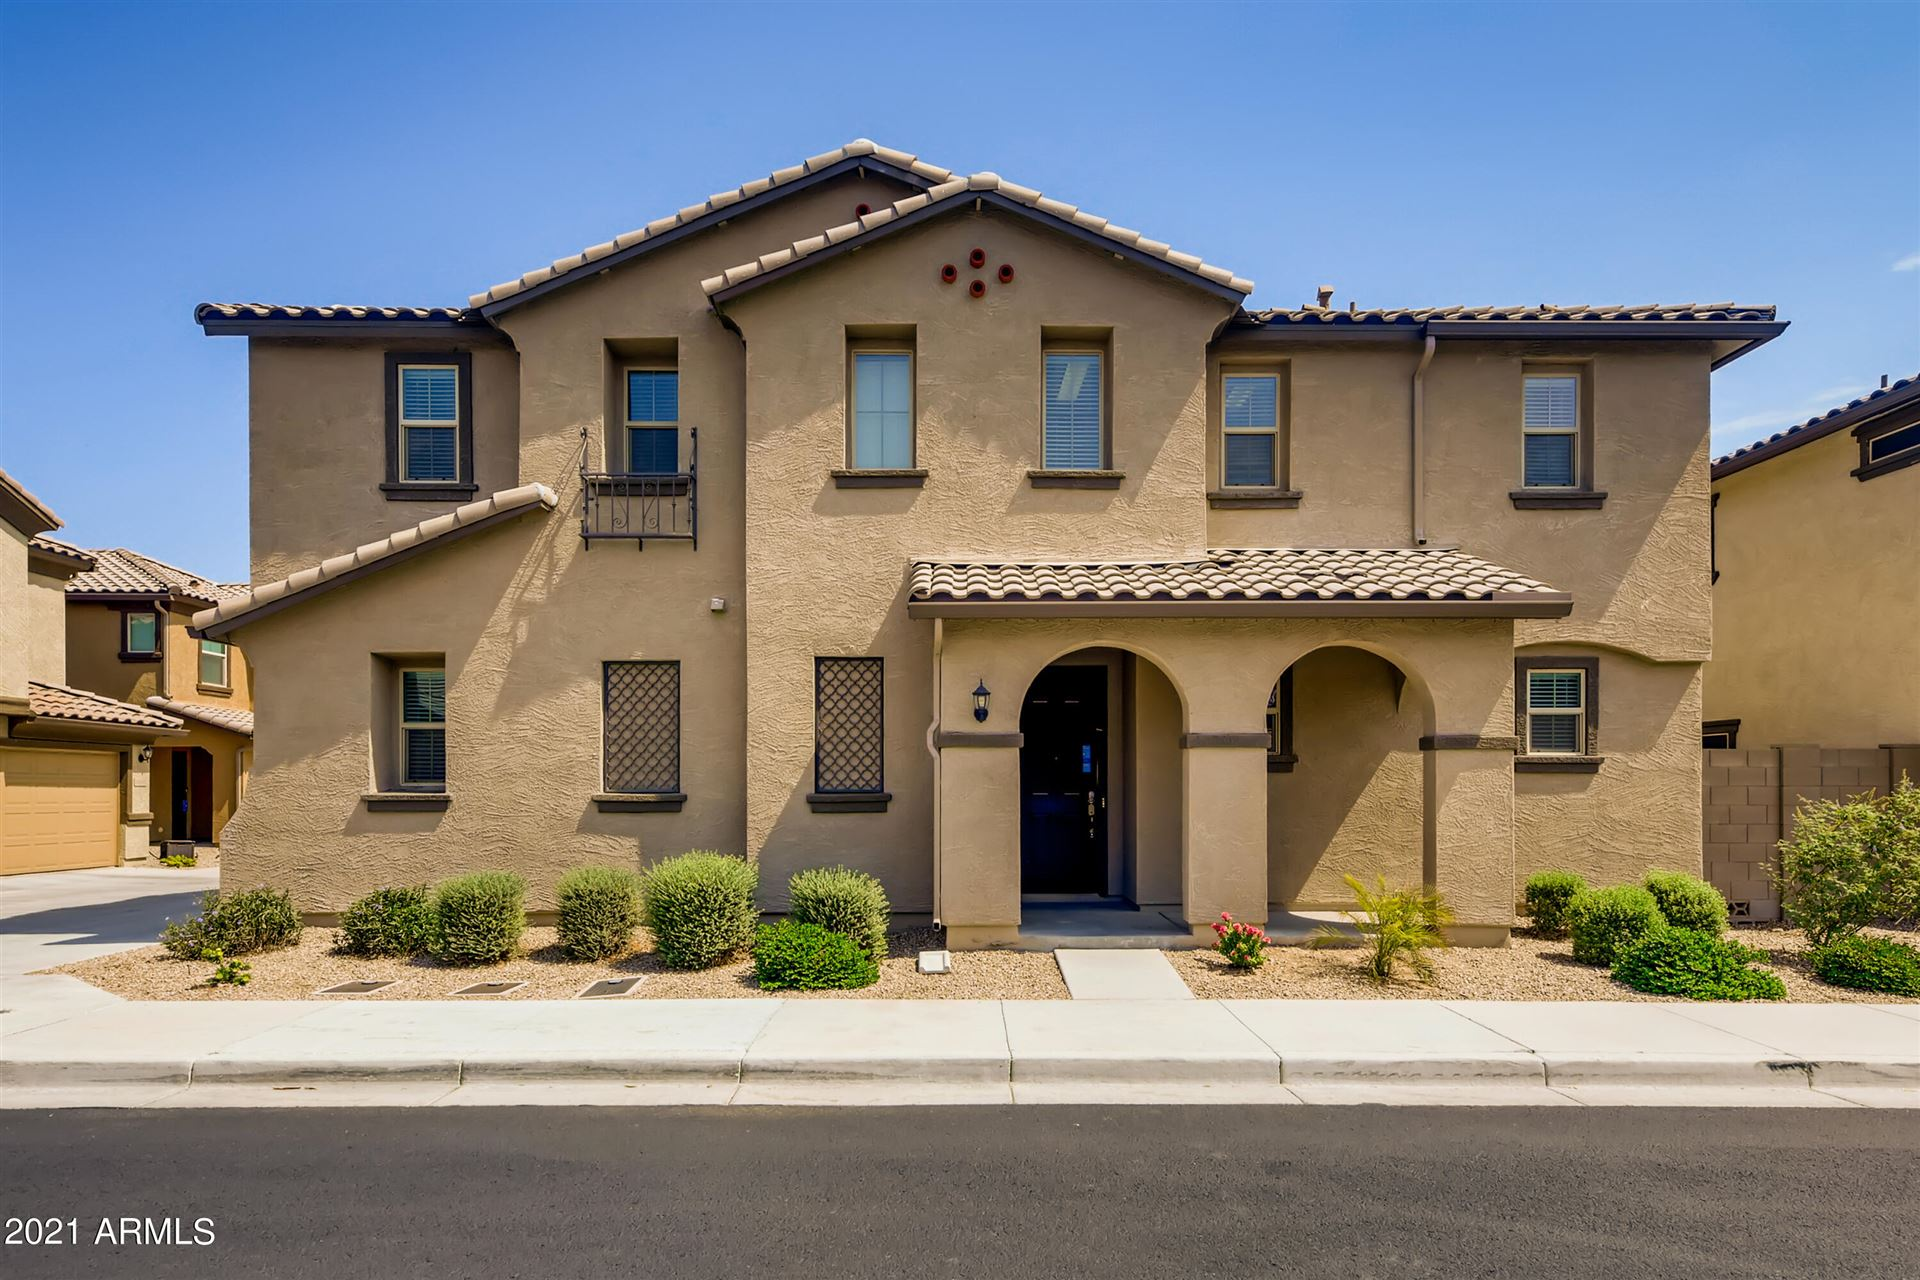 16550 W CULVER Street, Goodyear, AZ 85338 - MLS#: 6265231